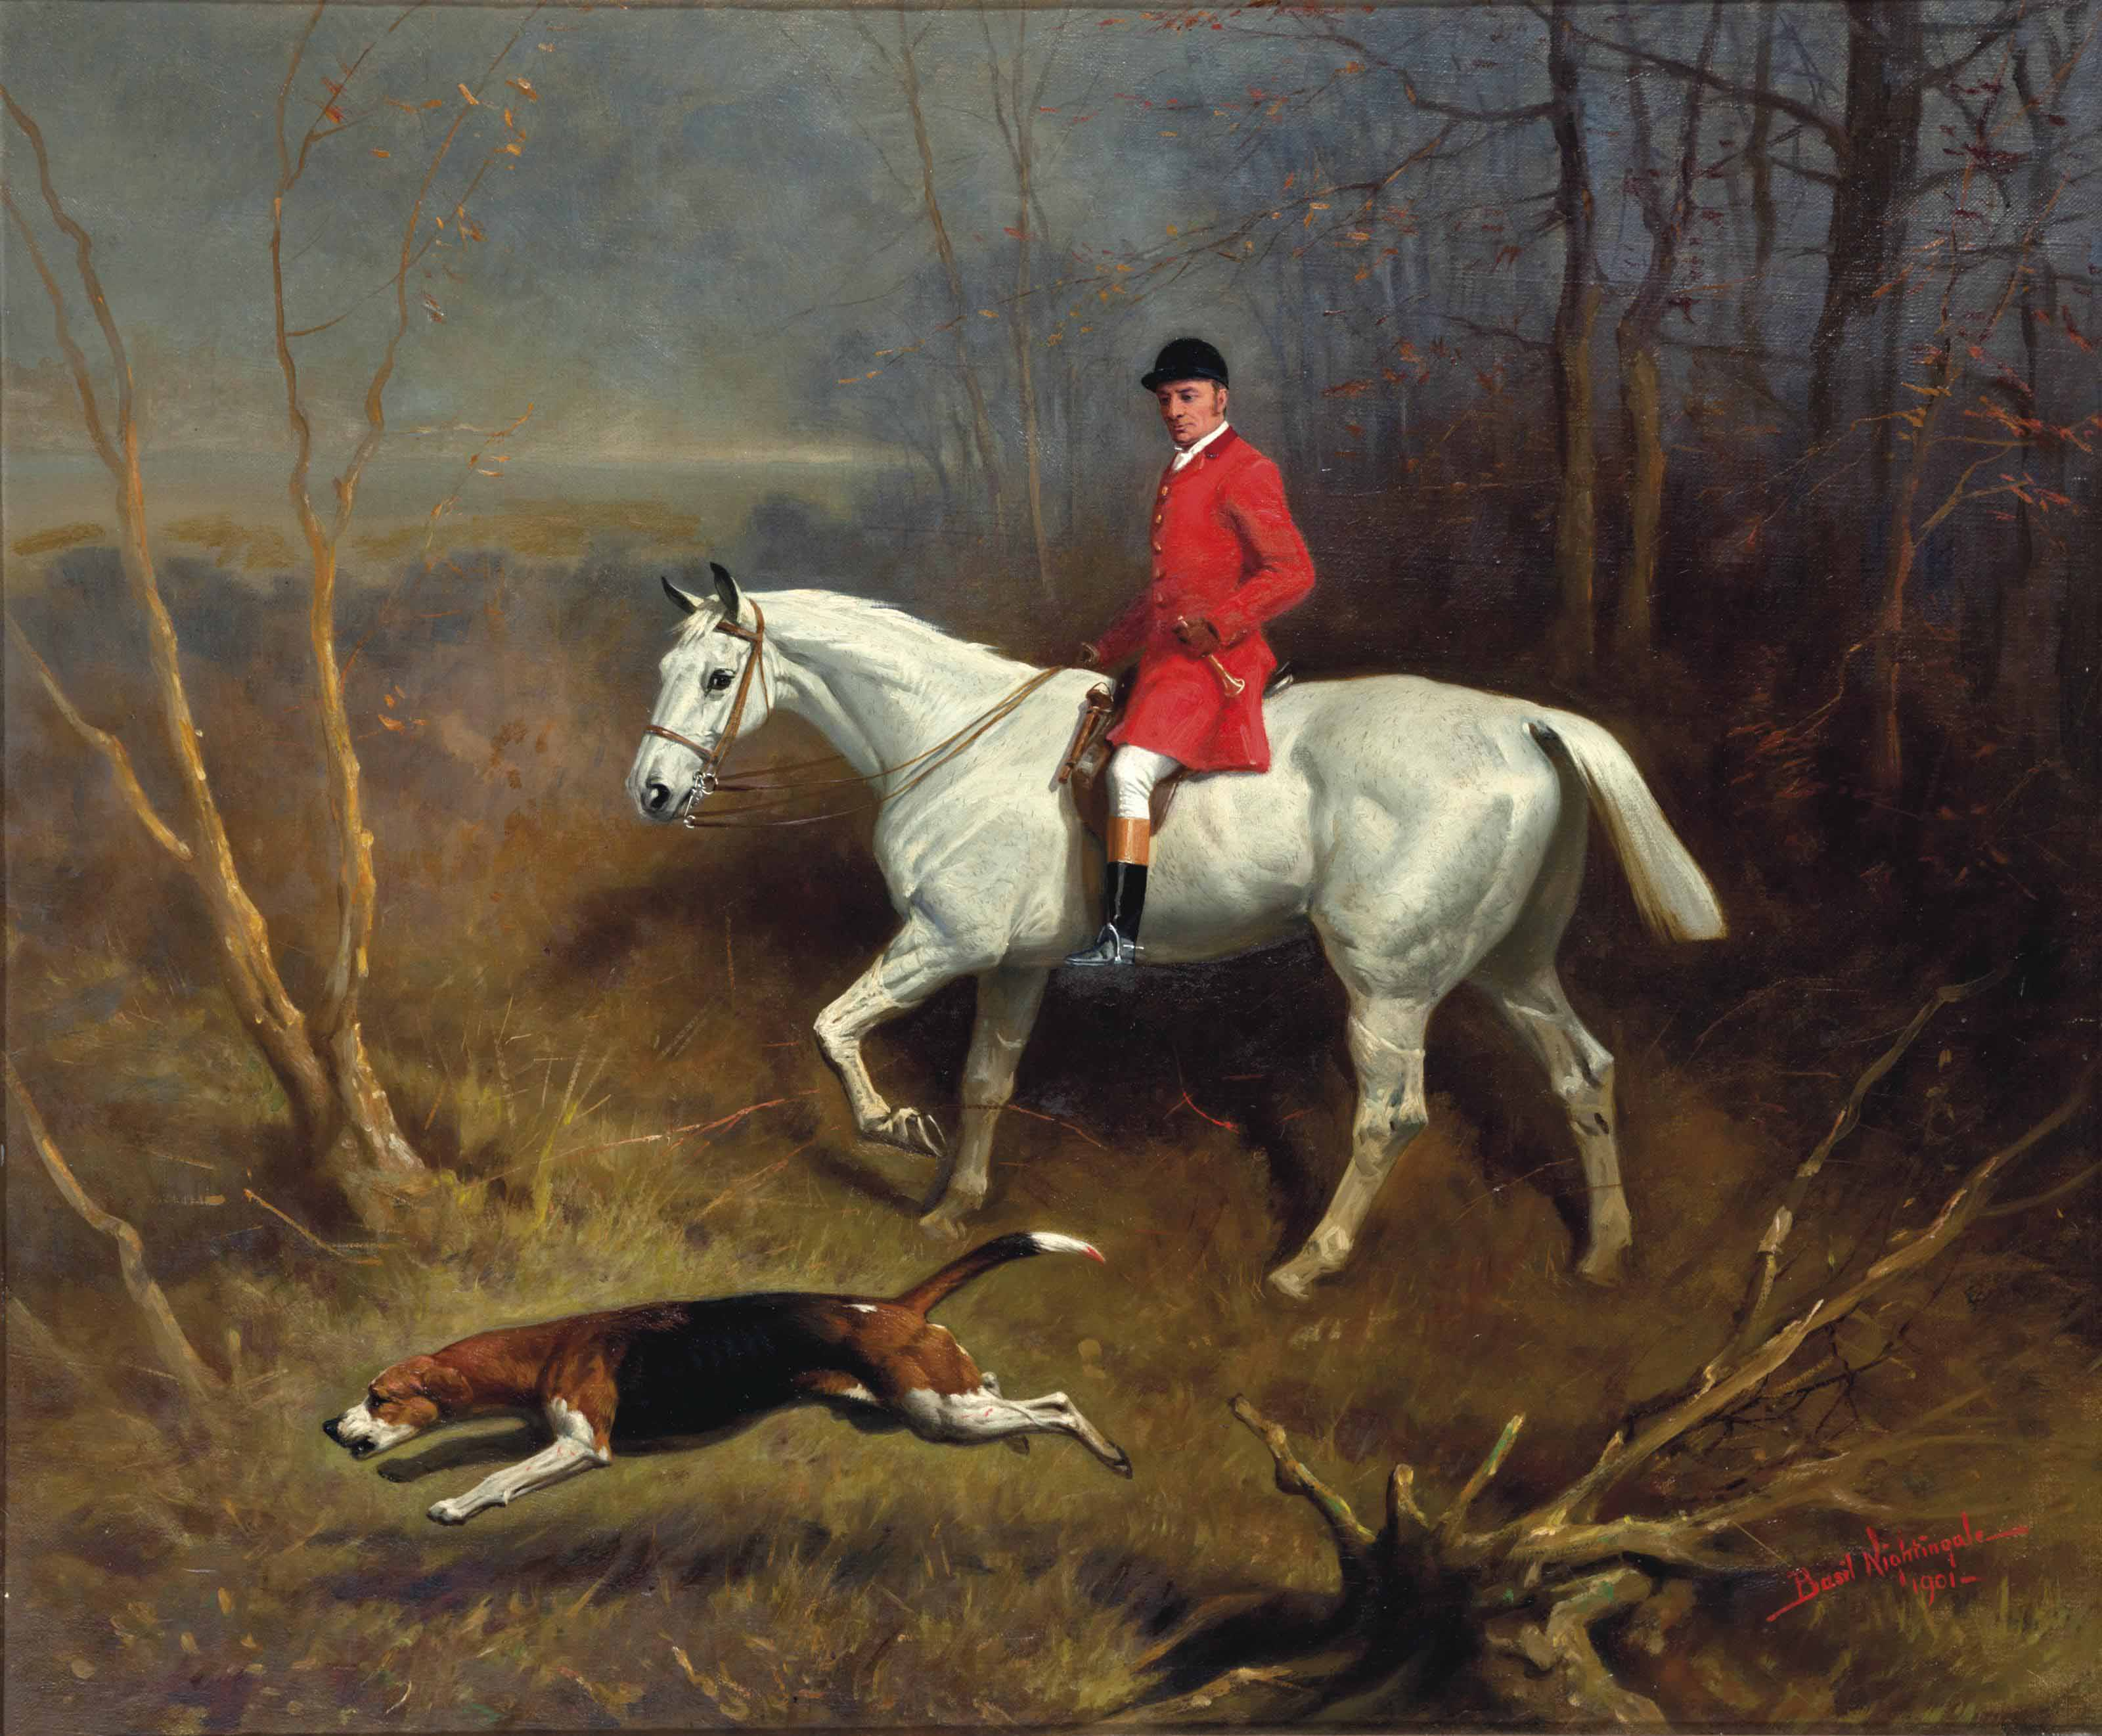 Gillard, Grey Bolt, A Huntsman on a Grey Horse, Riding through a Wood with a Hound on the Scent